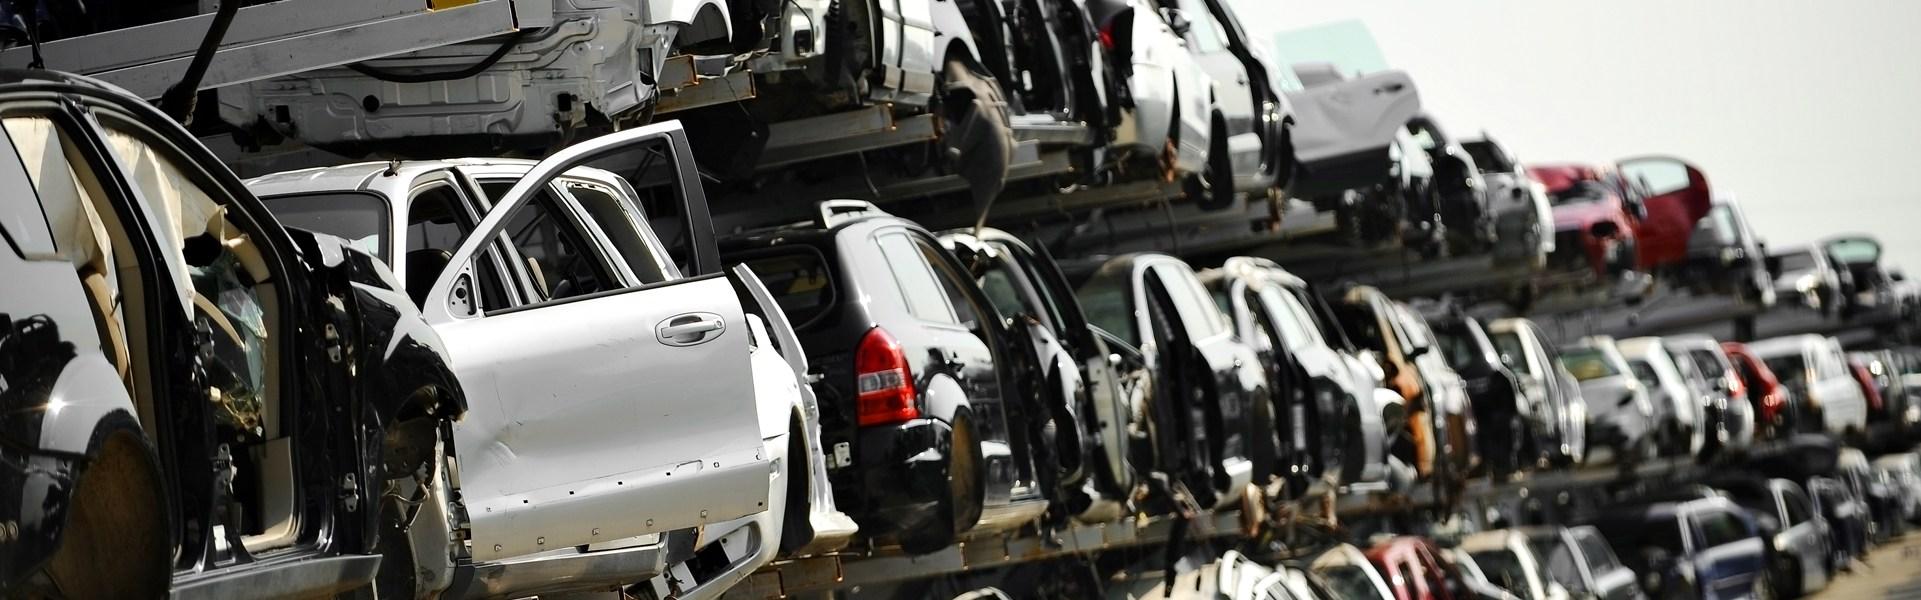 Scrap My Car Buckinghamshire : Scrap My Car 4 Me